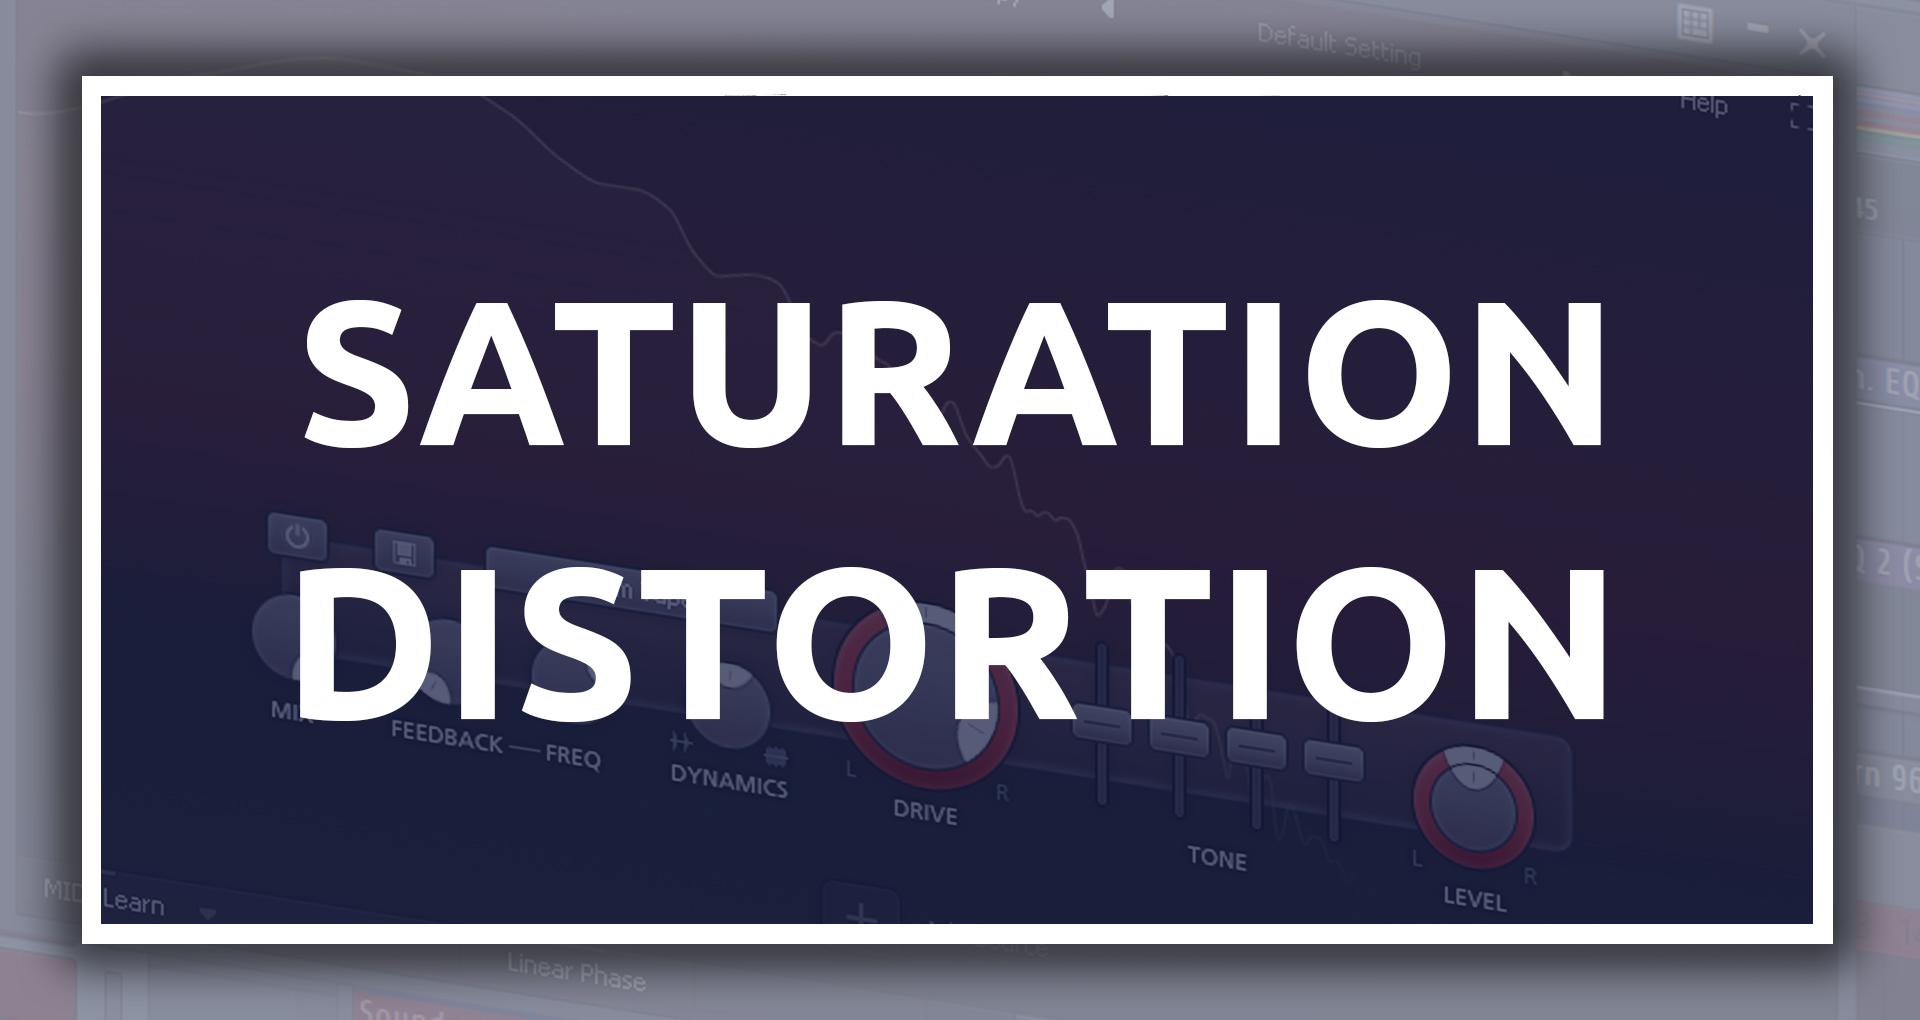 Saturation Distortion